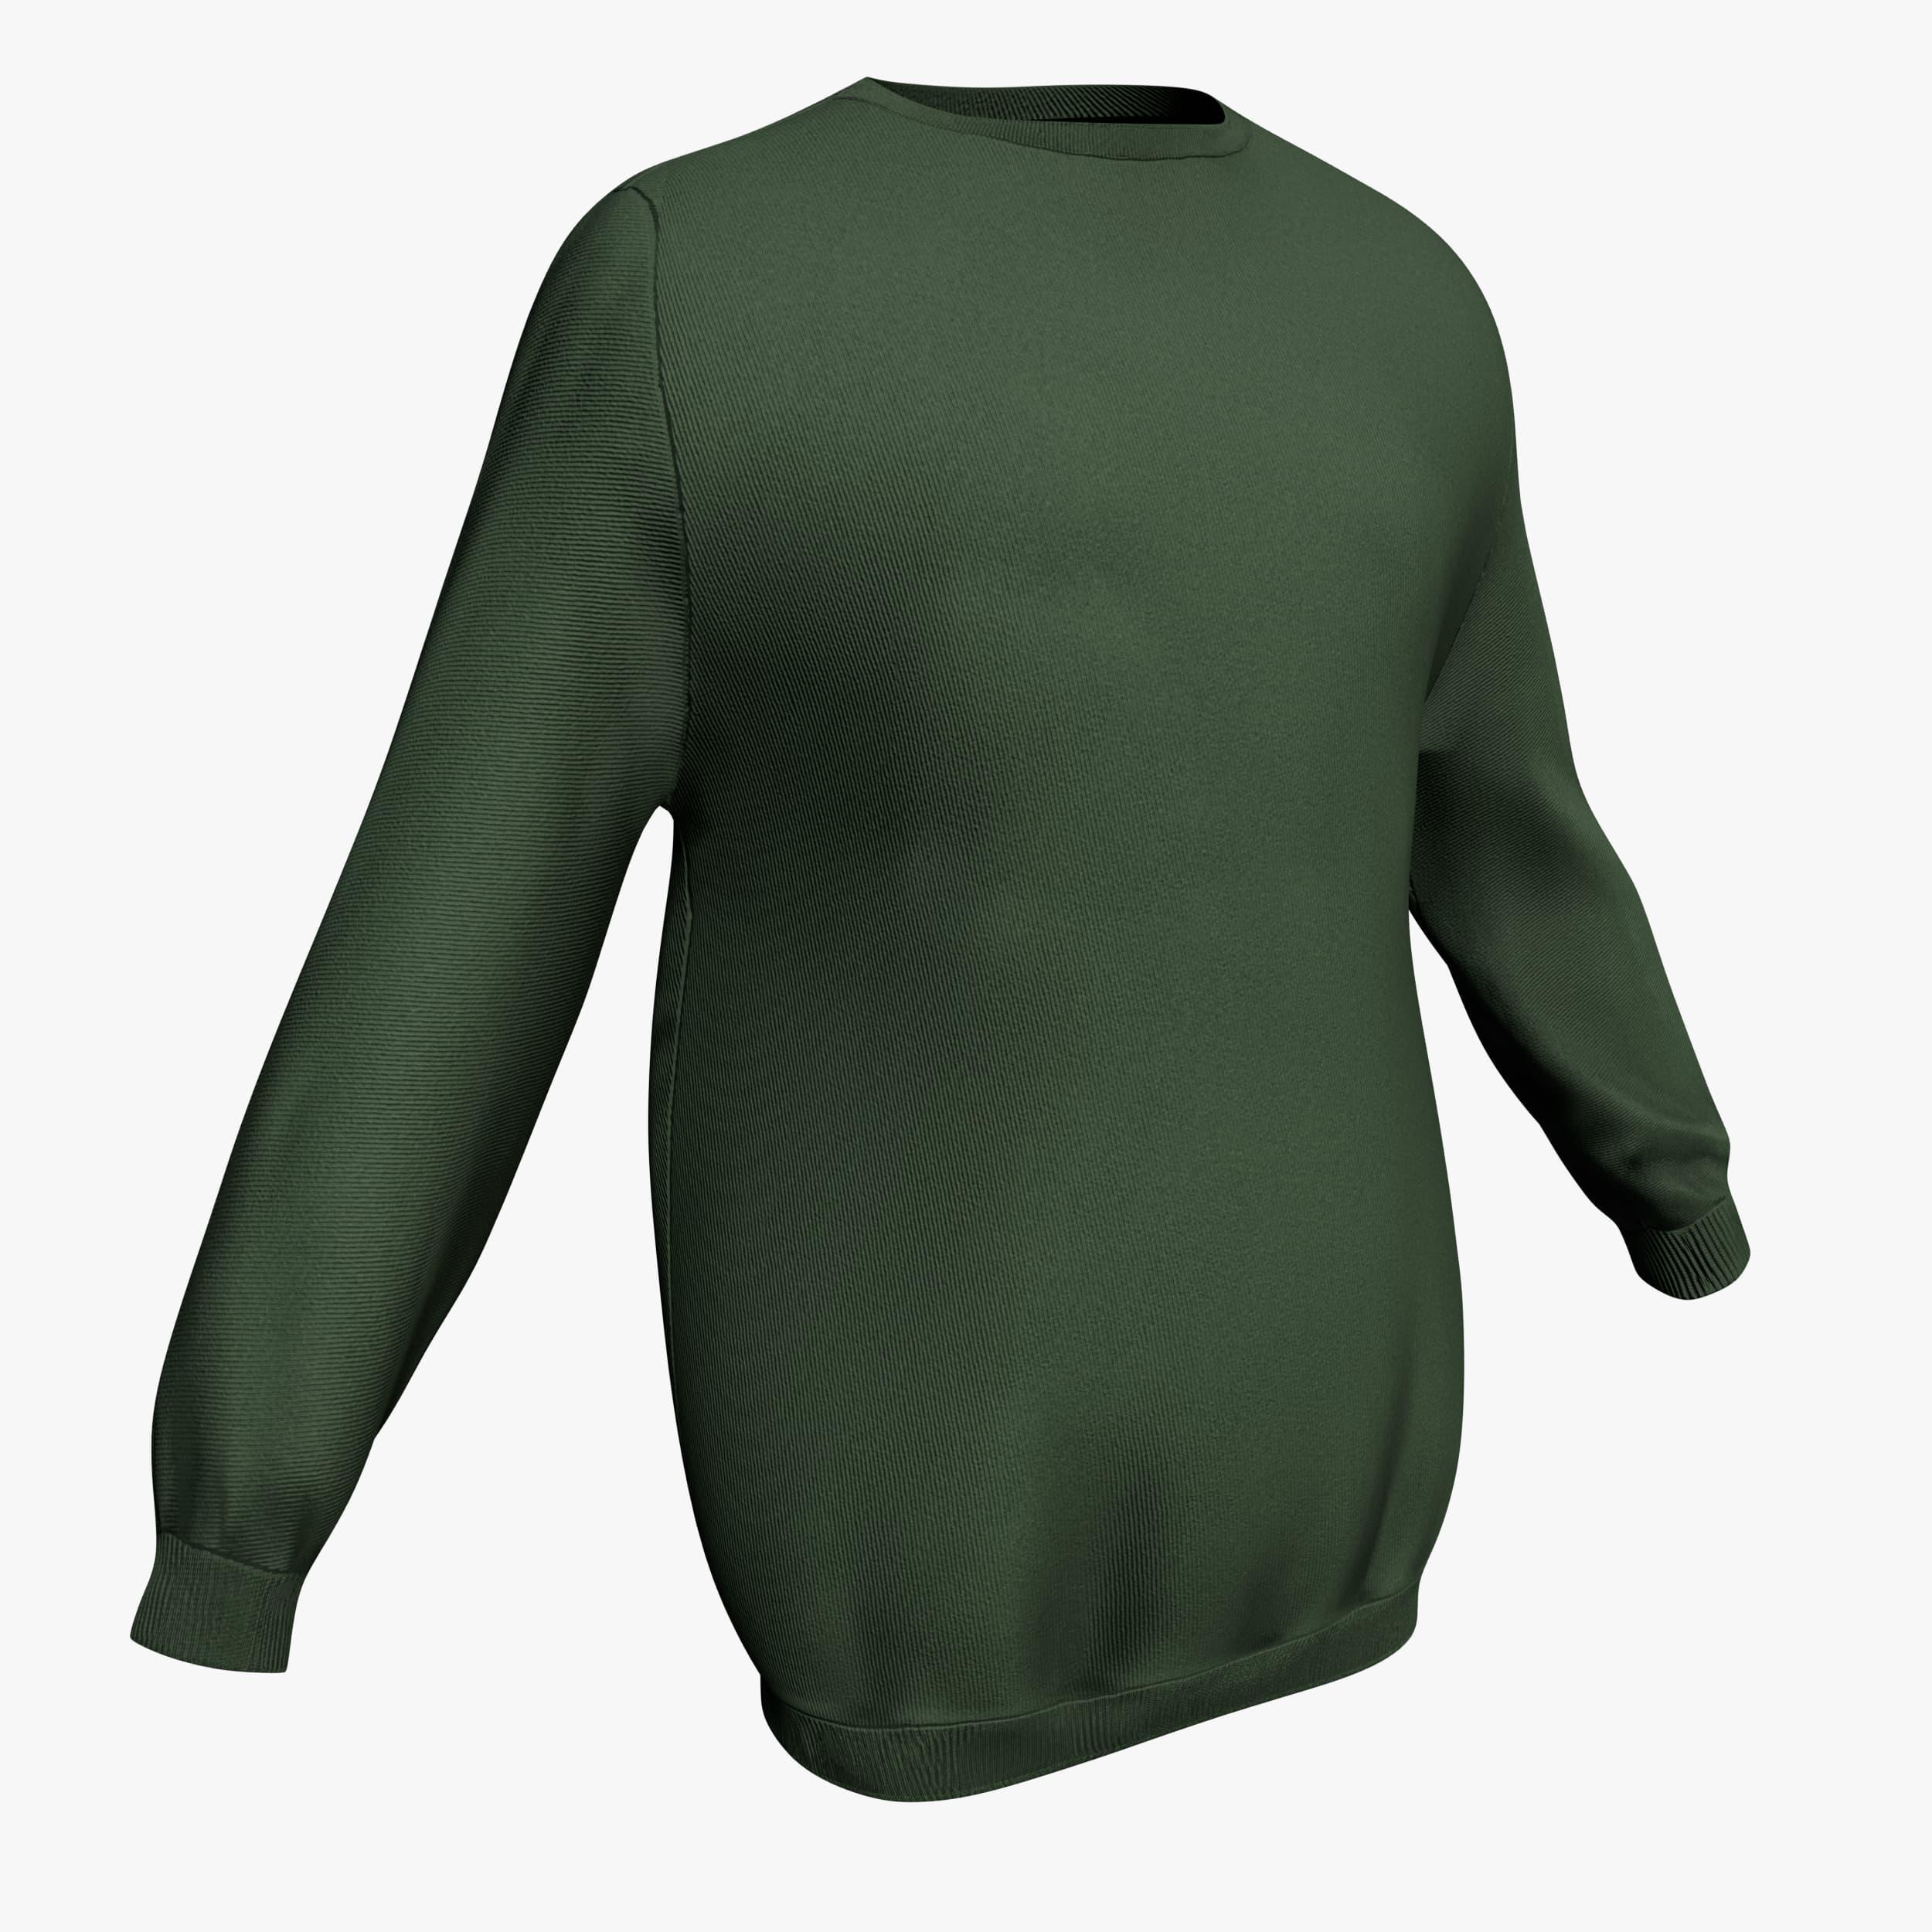 3d shirt sweatshirt sweats